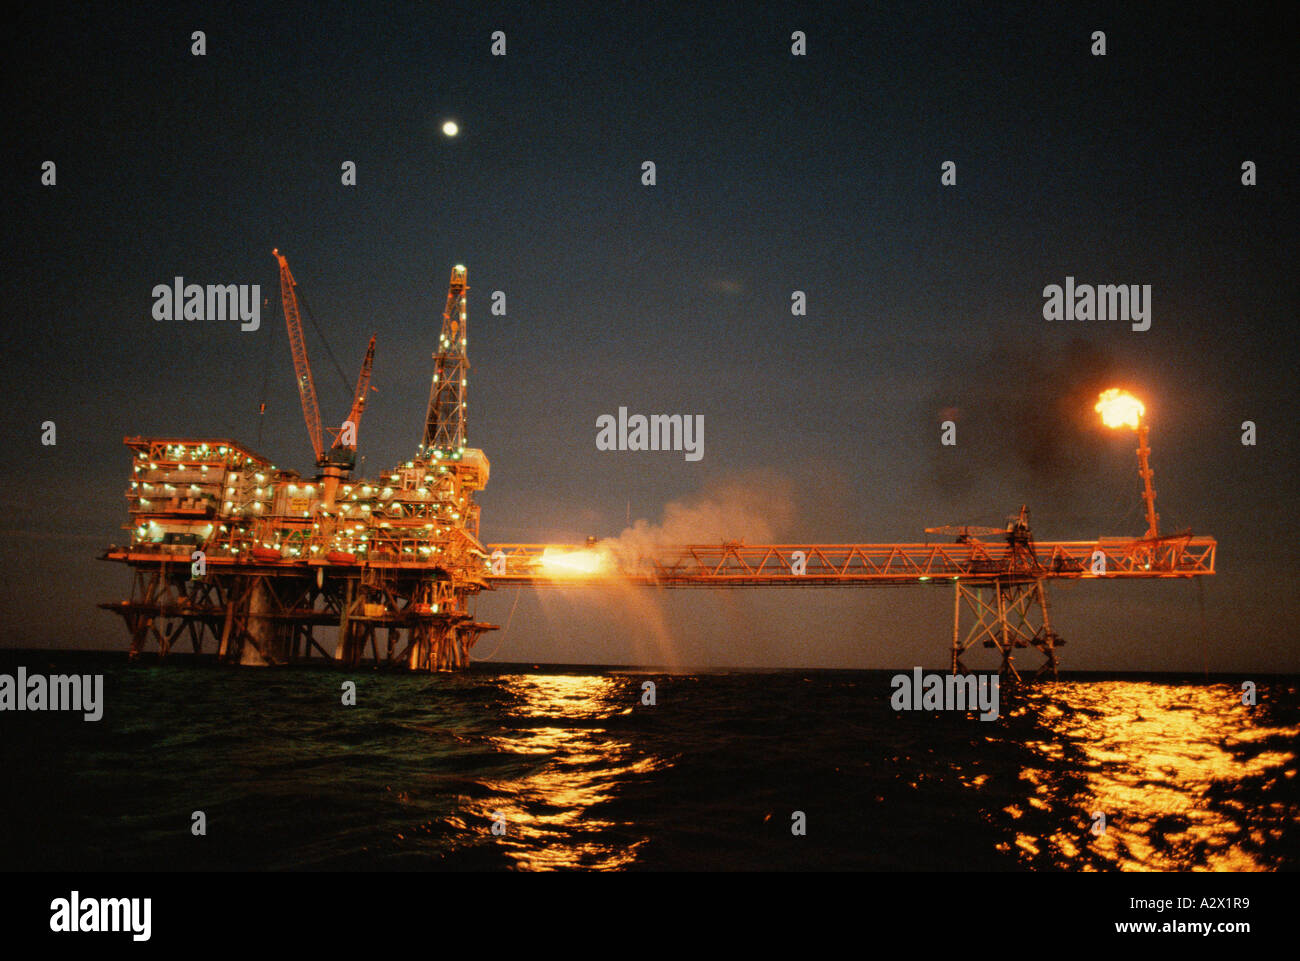 Western Australia. North Rankin A platform offshore gas rig. - Stock Image